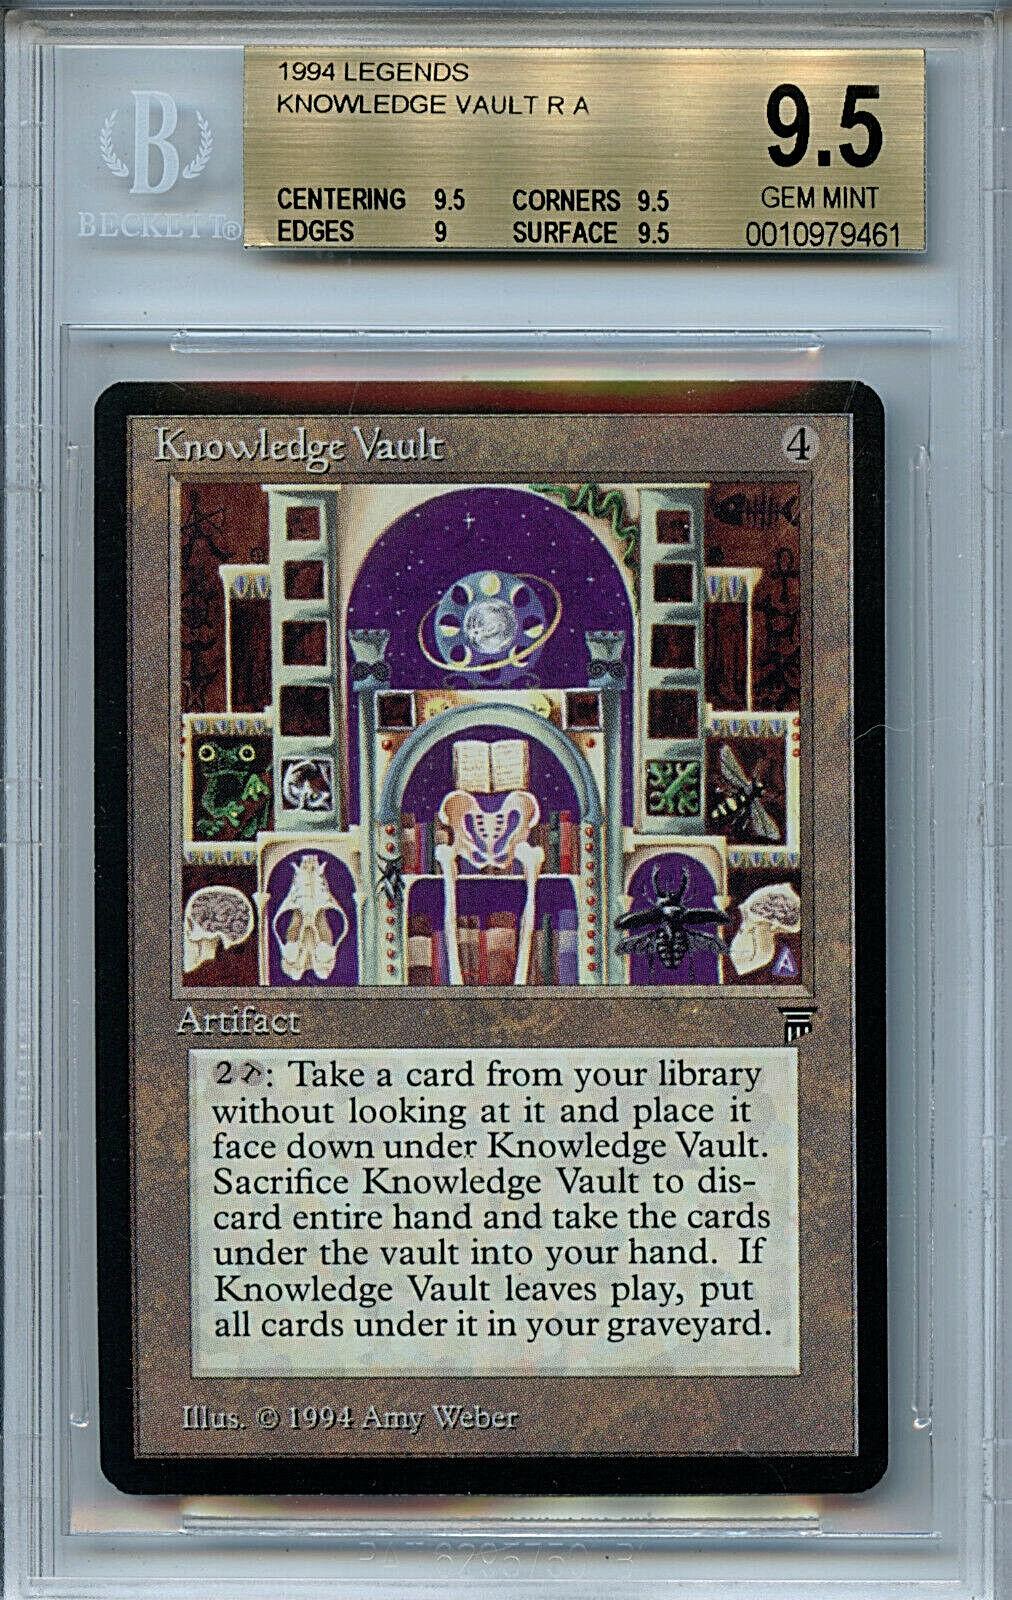 MTG Legends Knowledge Vault BGS 9.5 Gem Mint magic card Amricons 9461